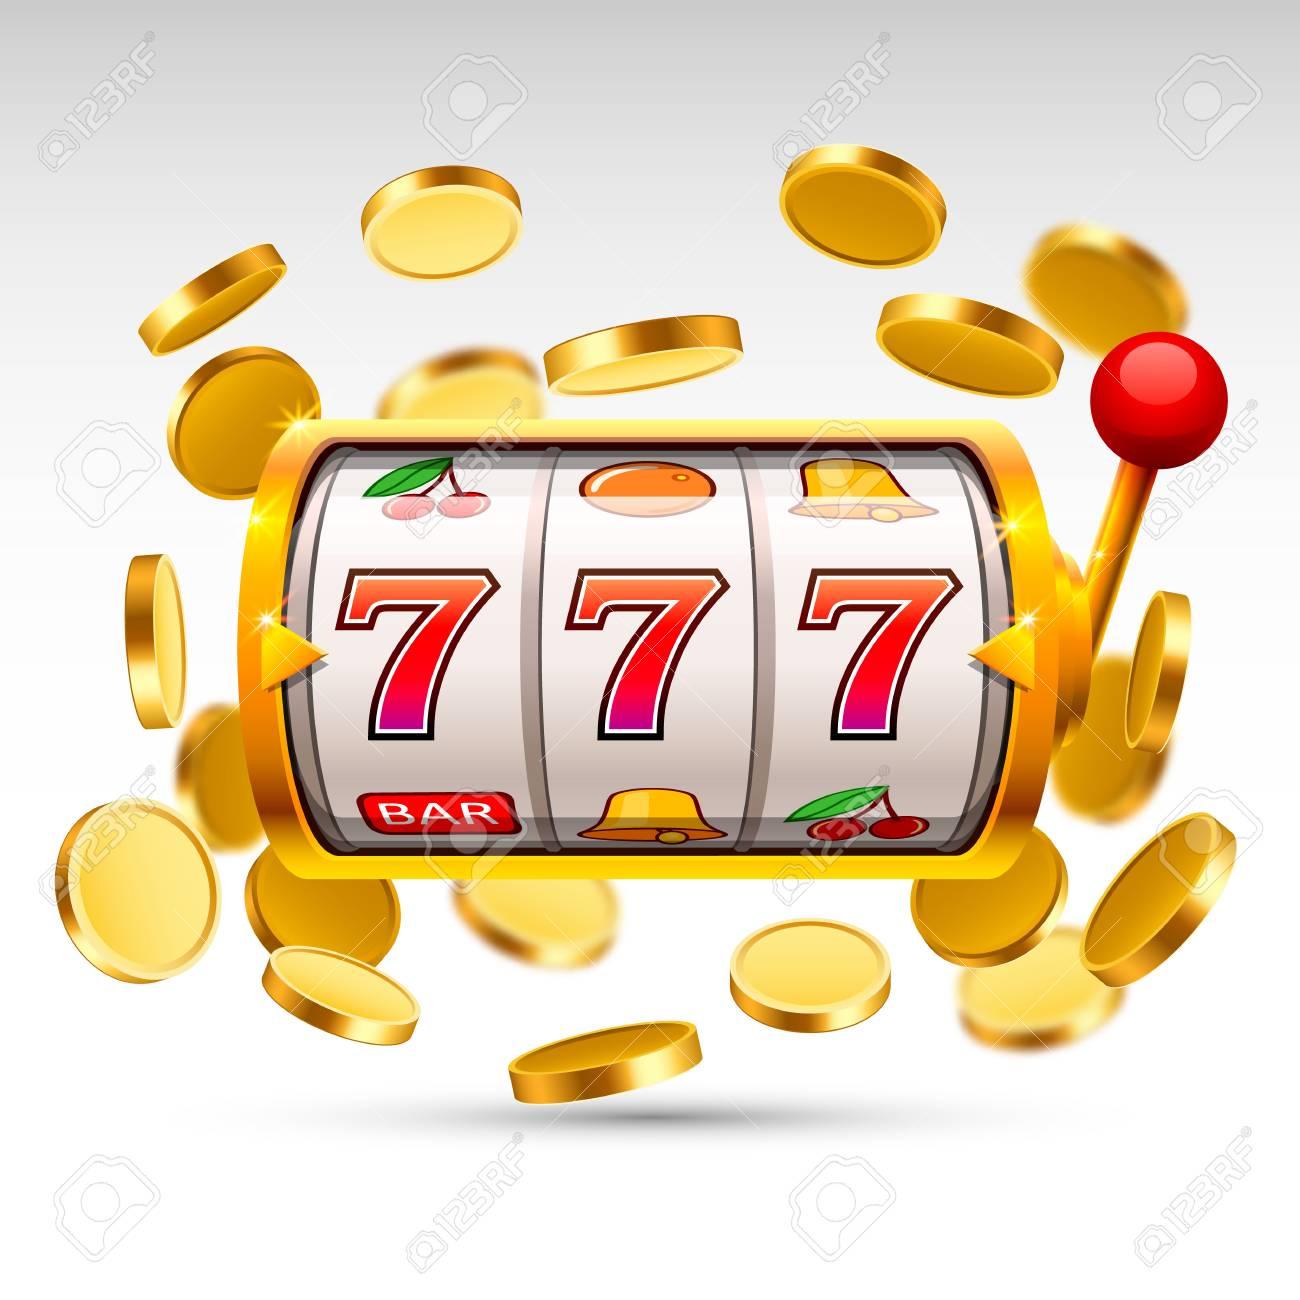 Golden slot machine wins the jackpot. - 85929821